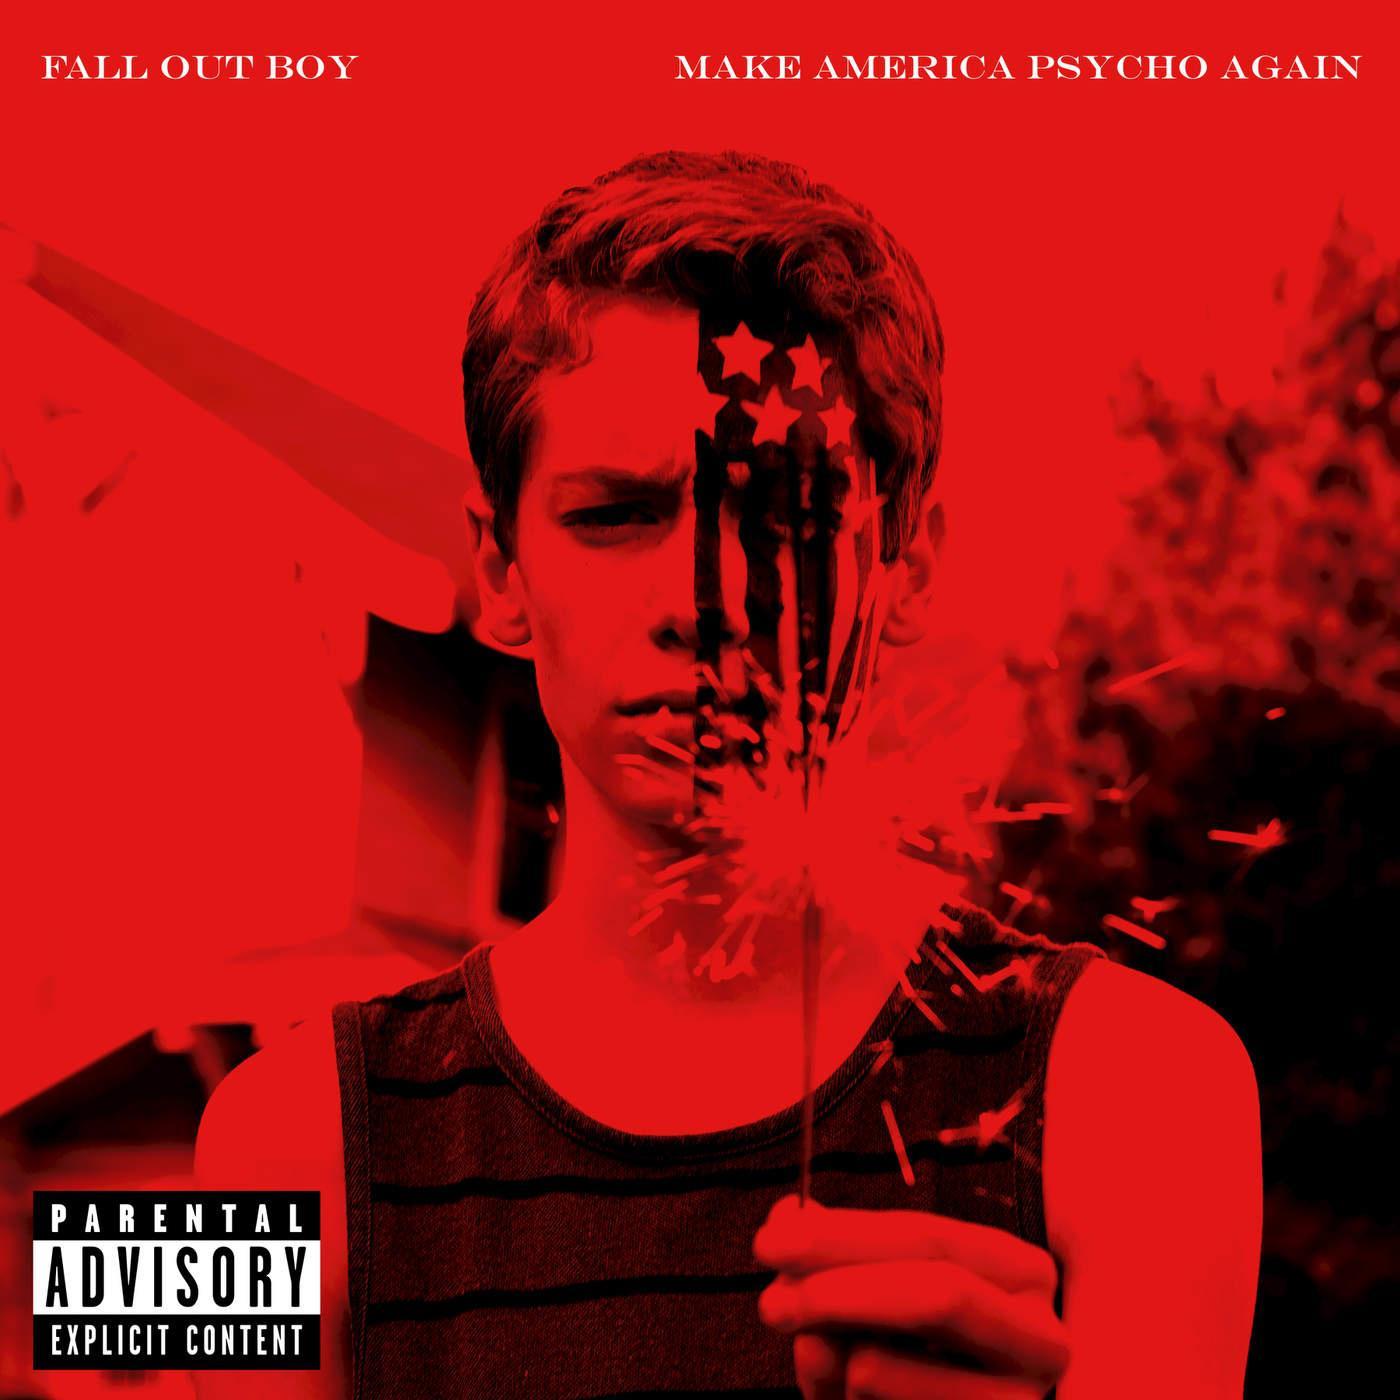 fall out boy热单_Make America Psycho Again - Fall Out Boy - 专辑 - 网易云音乐